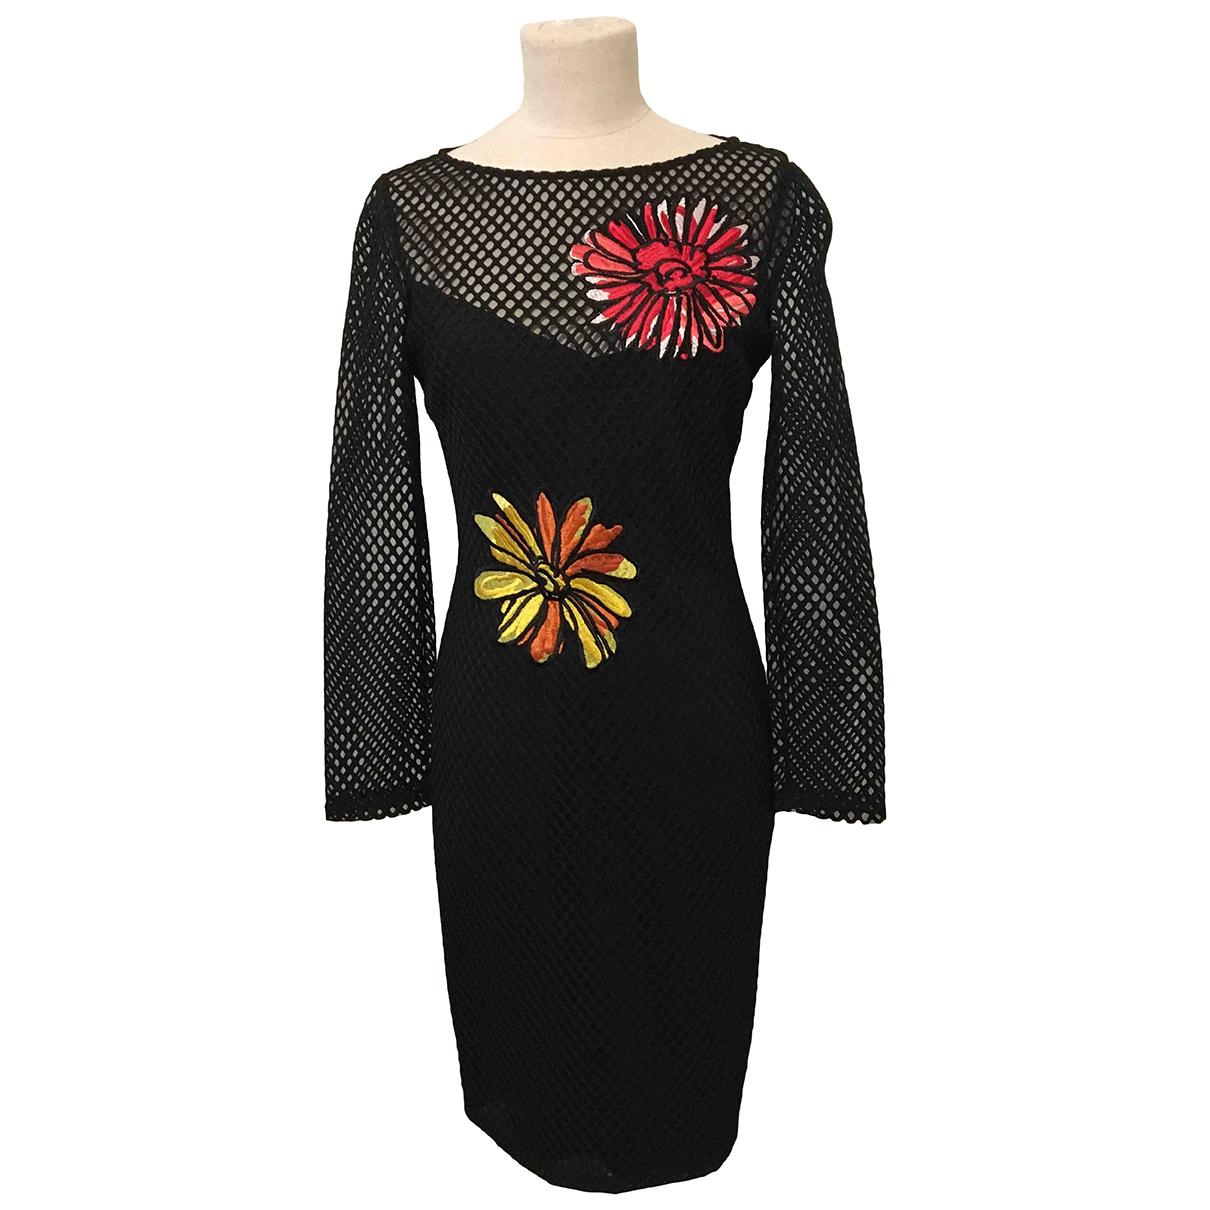 Moschino \N Black dress for Women 42 IT